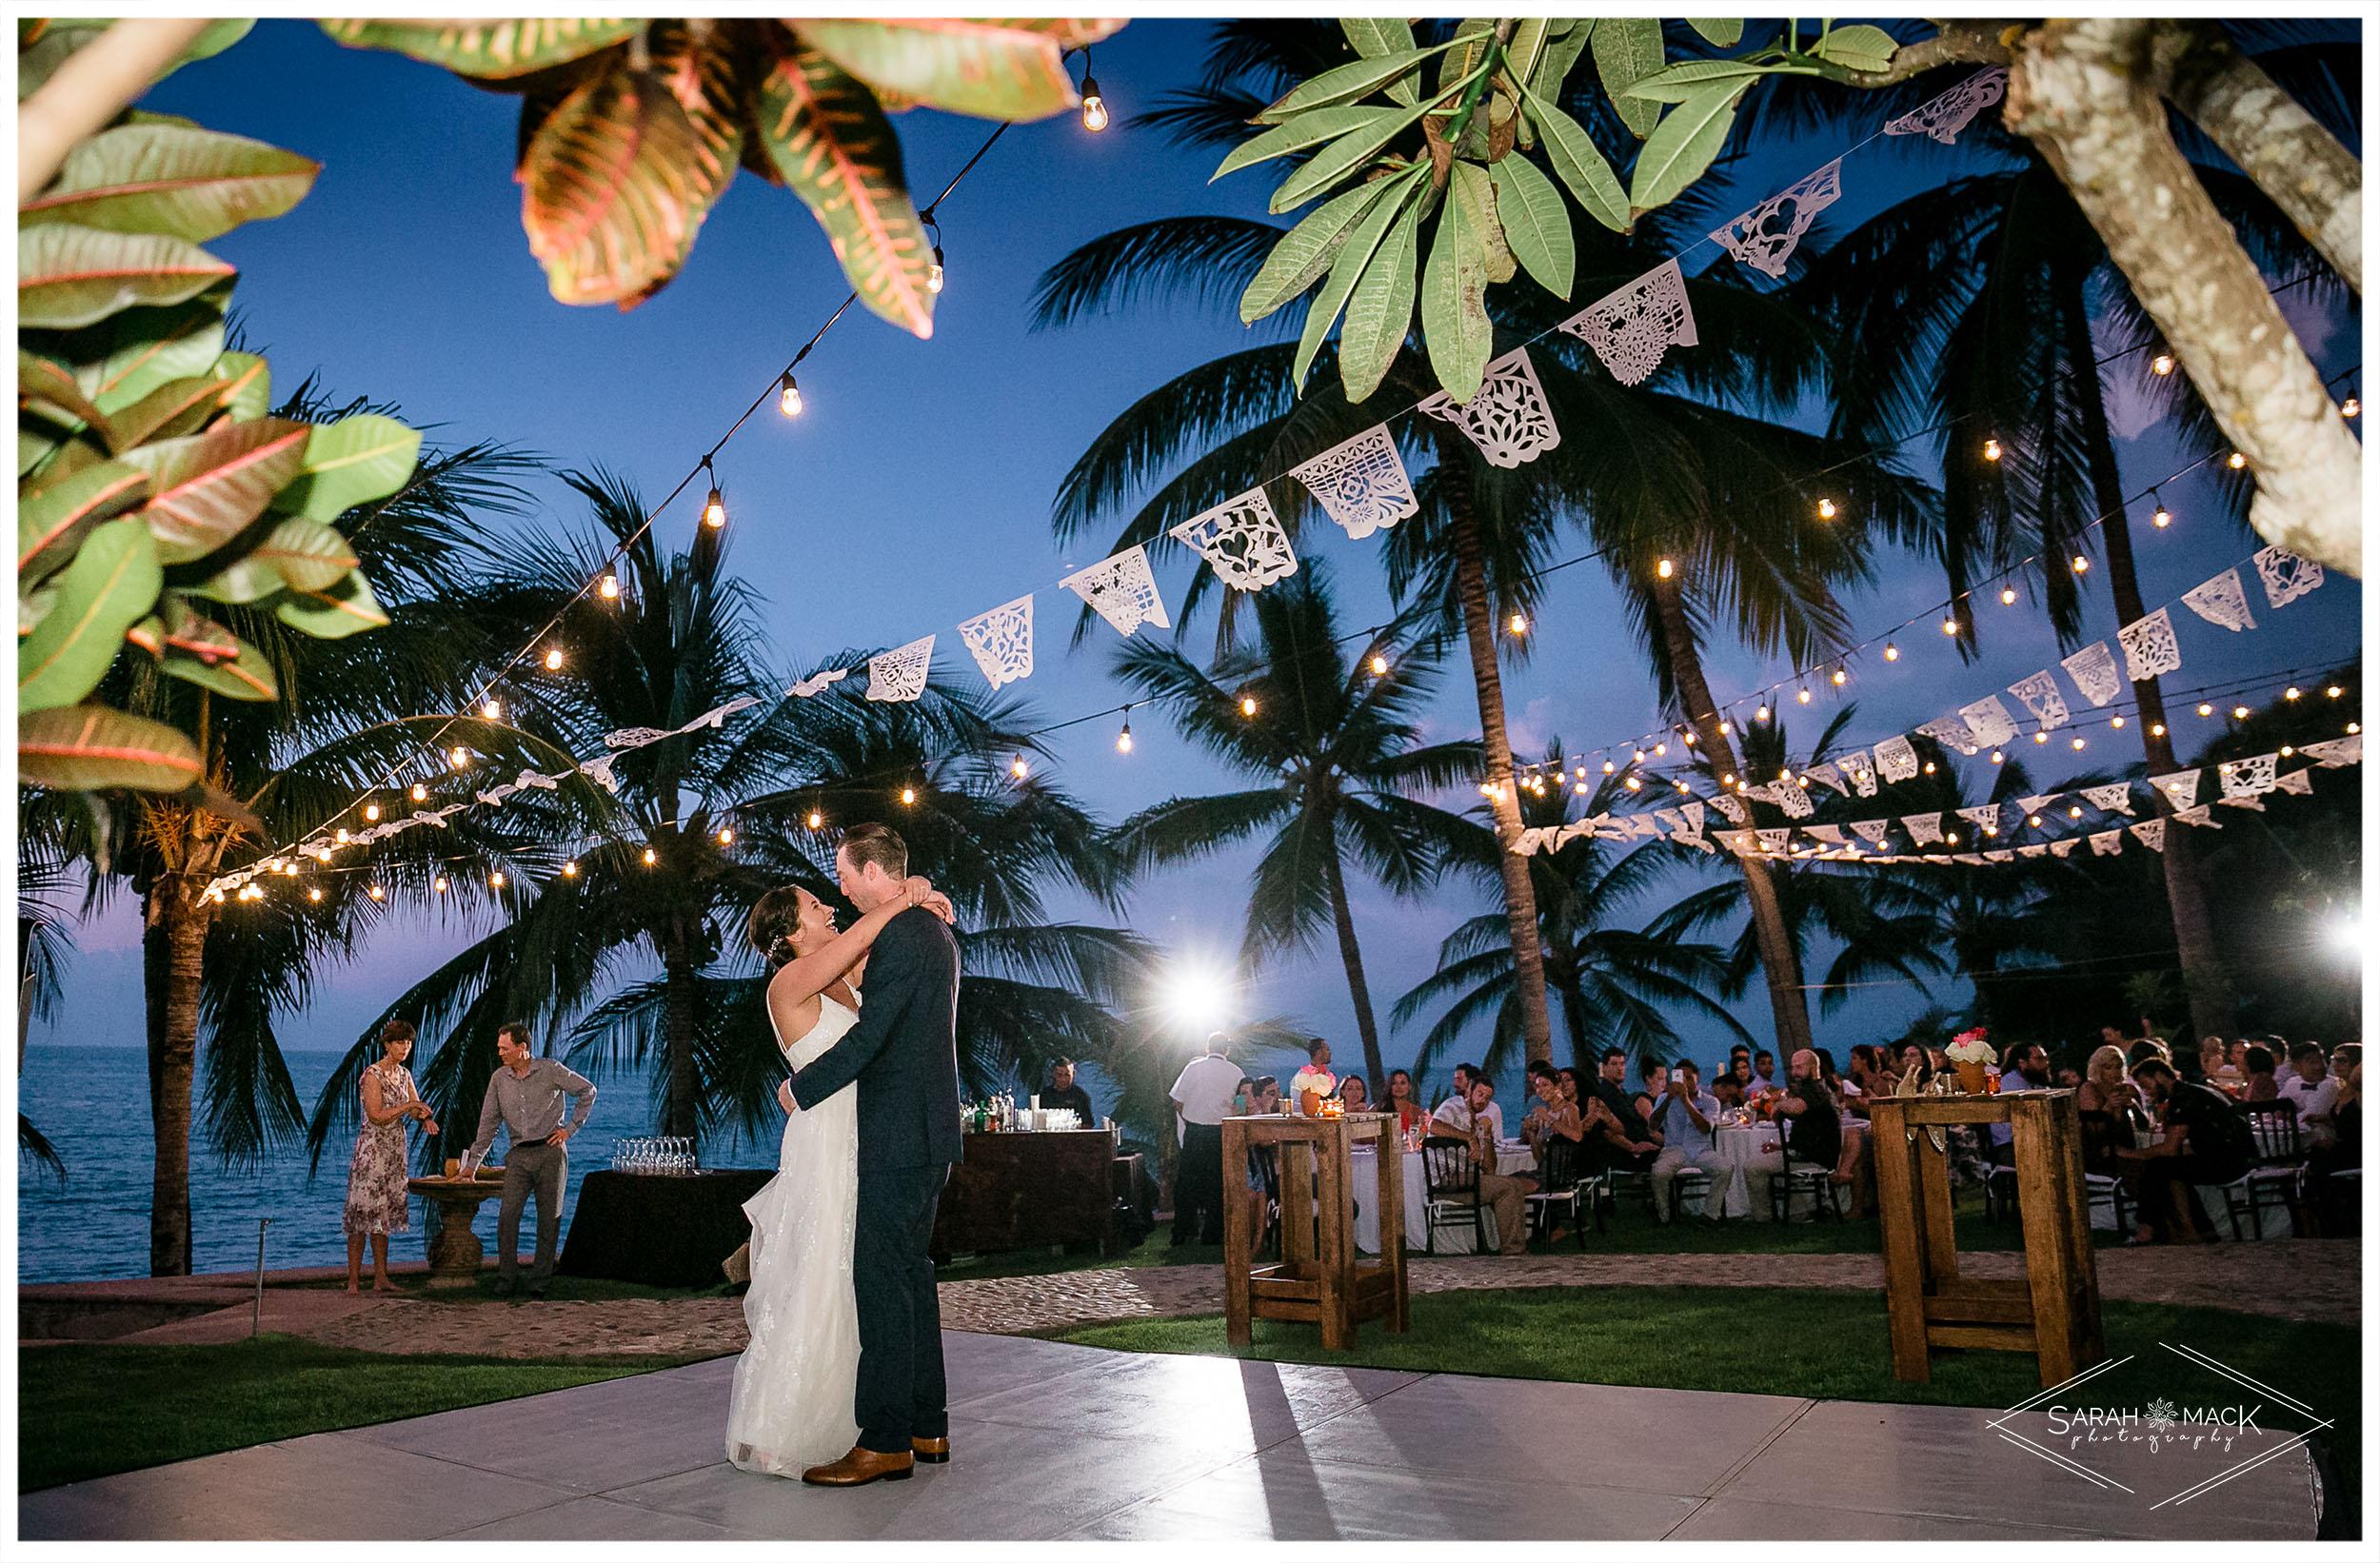 ES-Flor-de-Playa-Sayulita-Wedding-Photography-54.jpg